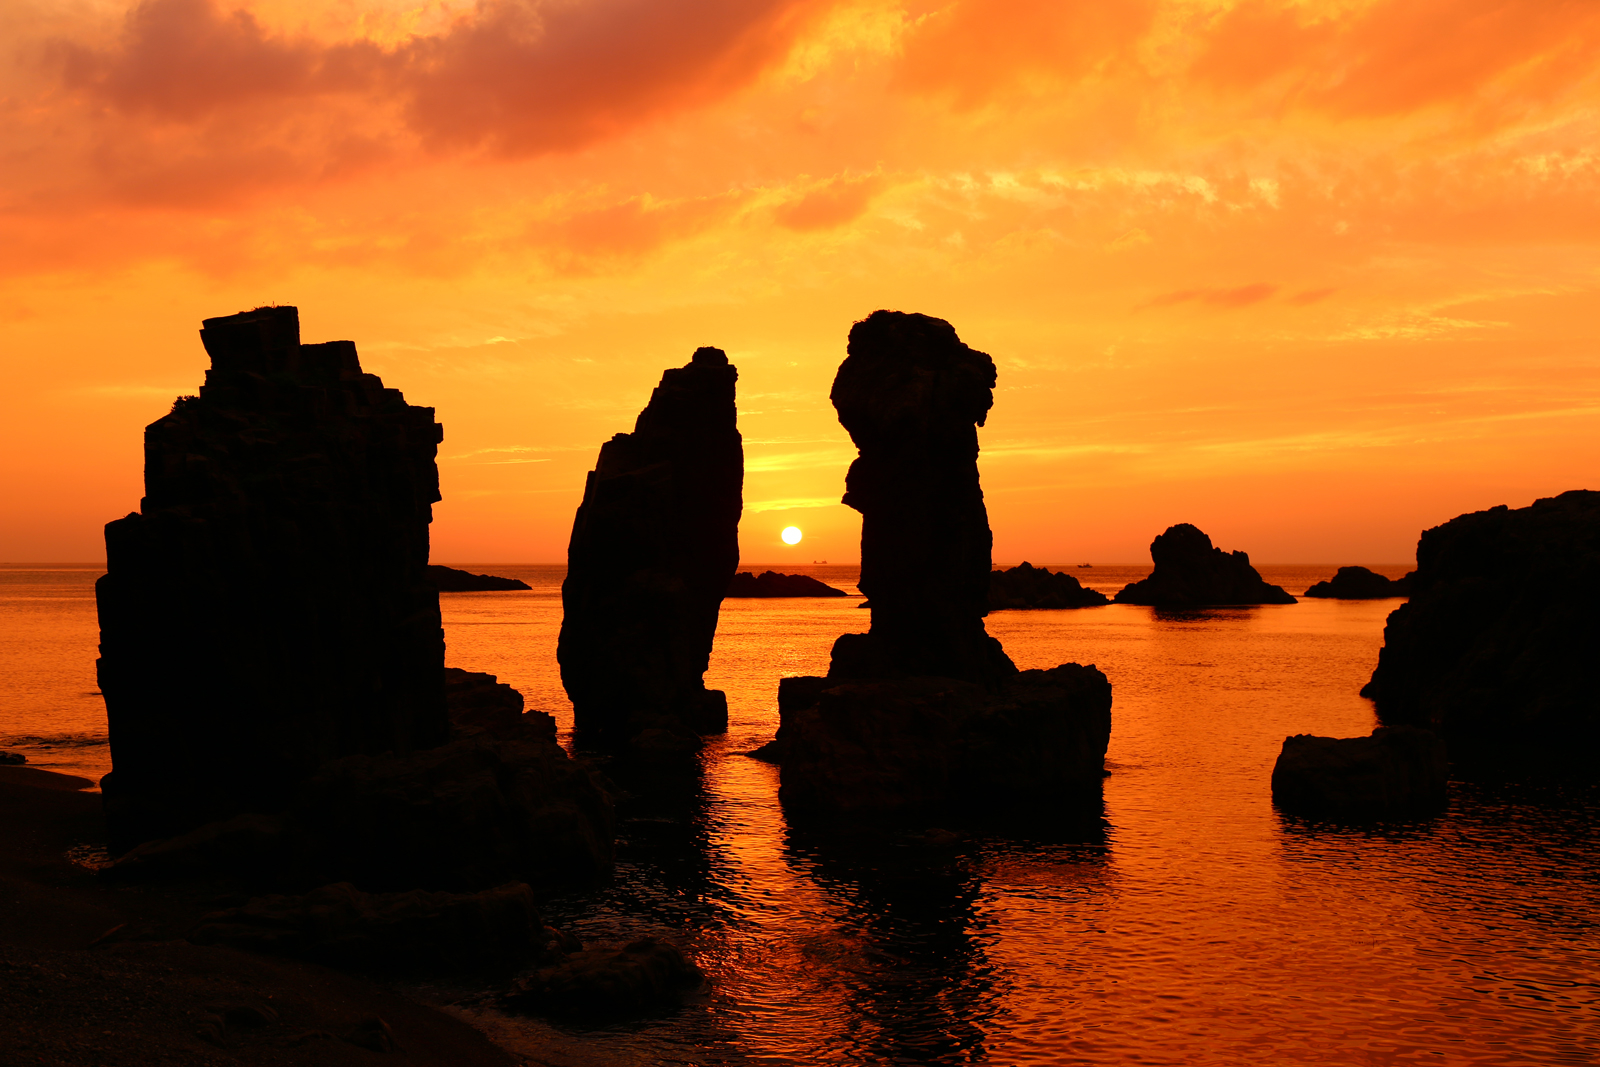 2. Omijima Island Nature Path